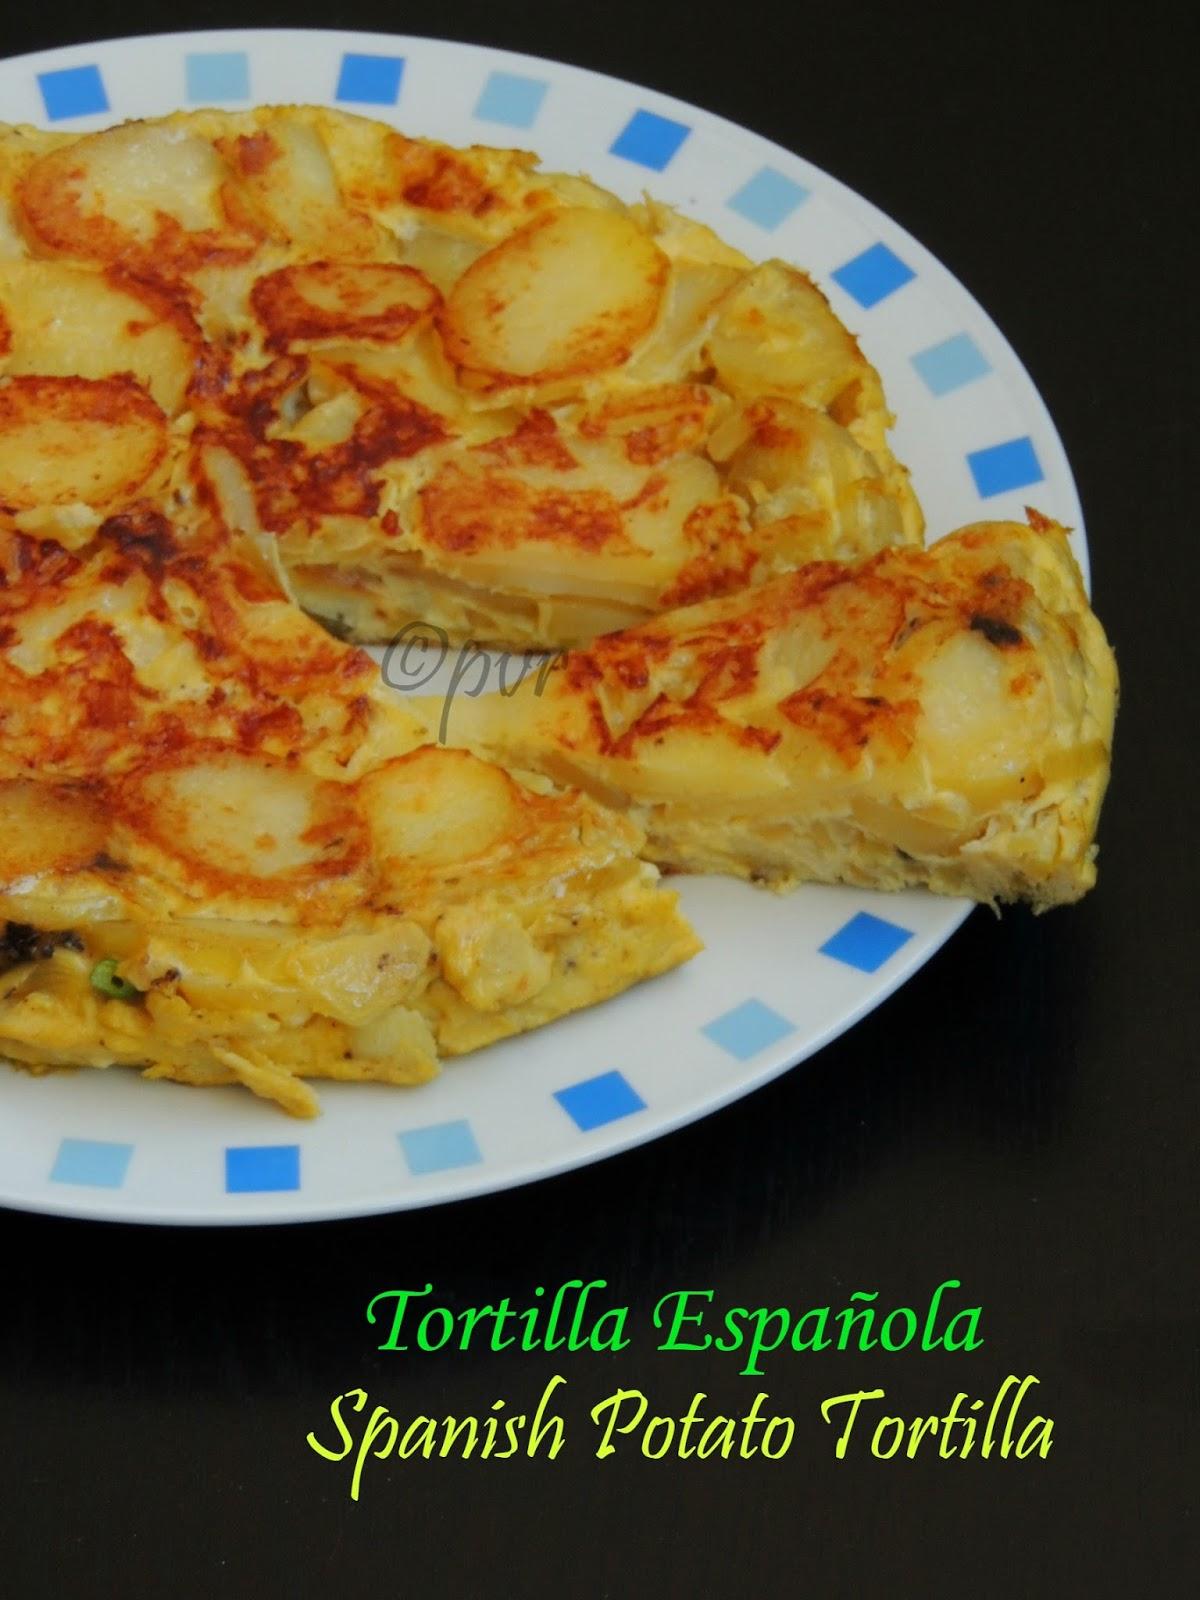 ... Tortilla Española & Sofrito - Spanish Potato Tortilla & Spanish